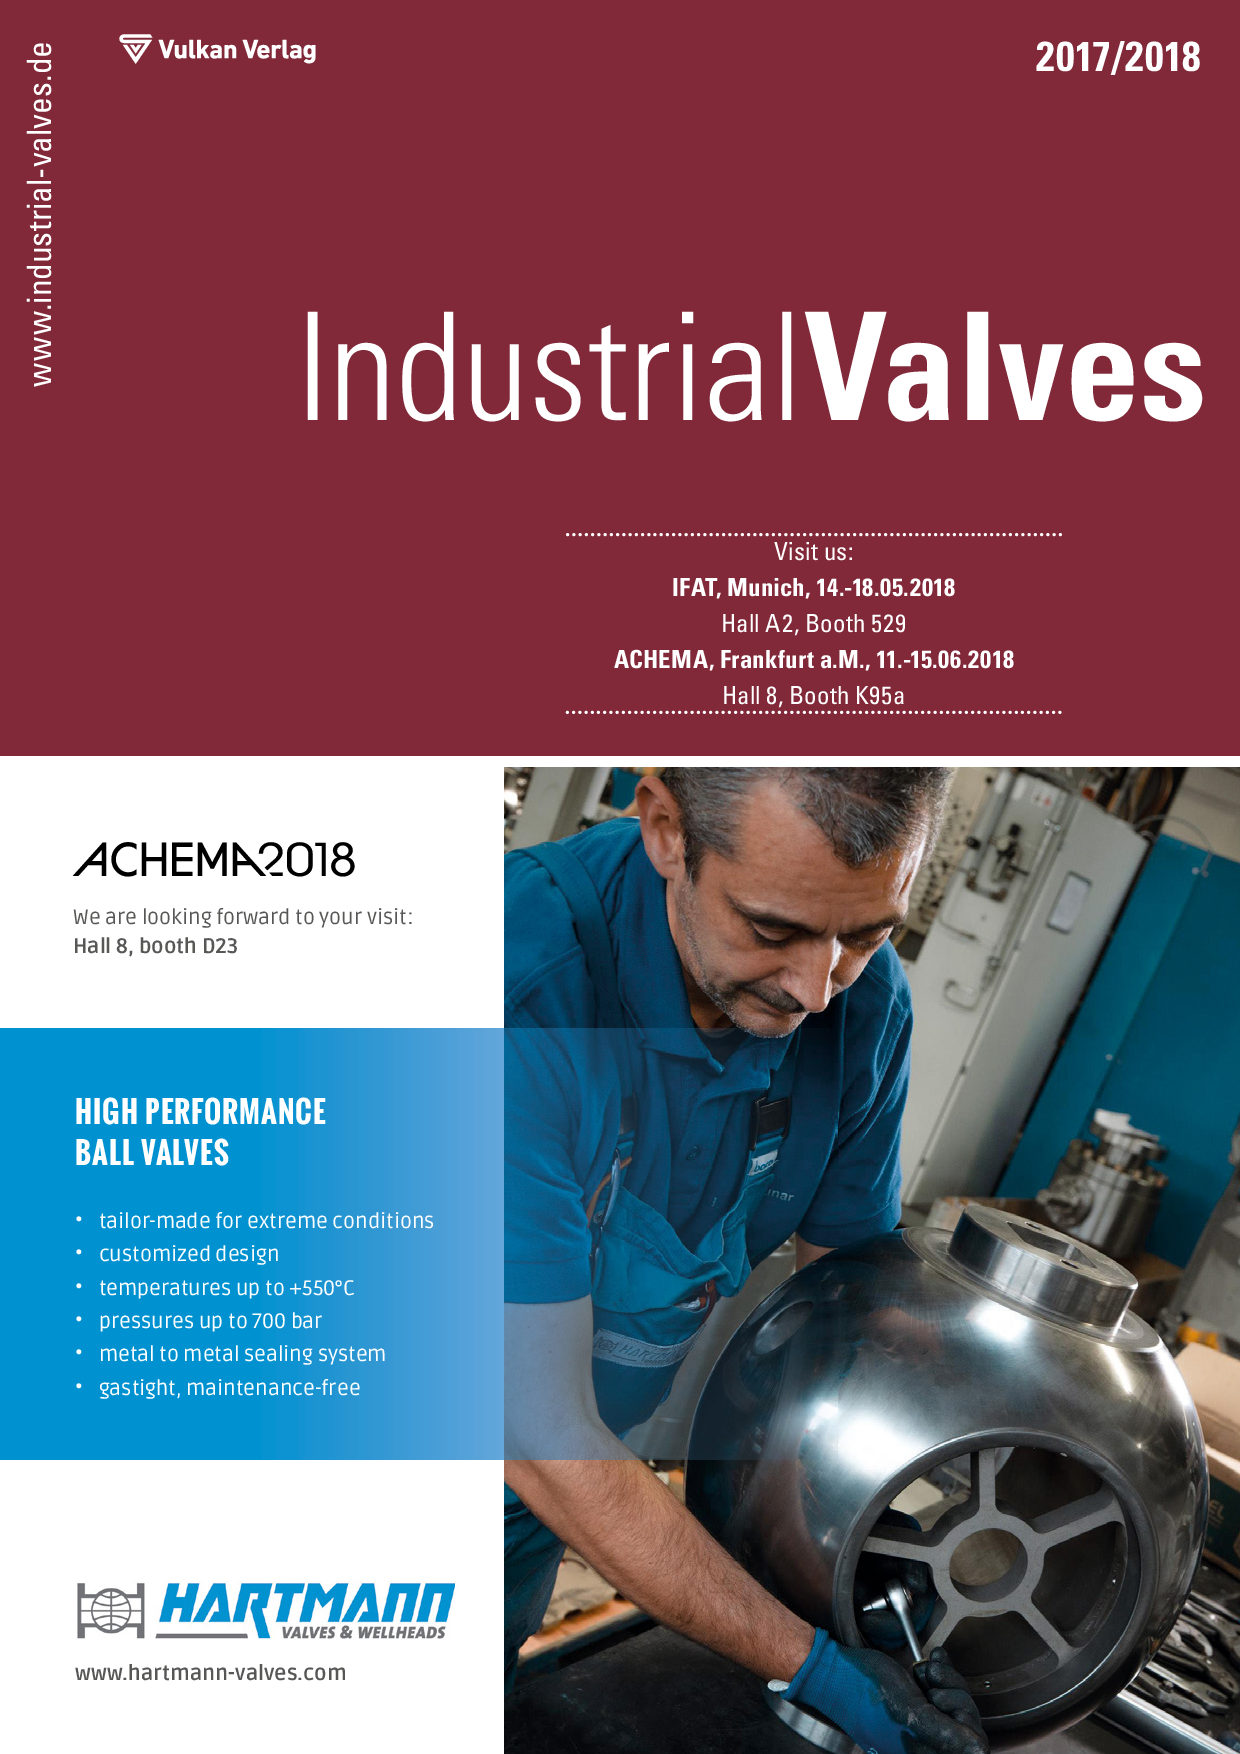 Industrial Valves – 2017/2018